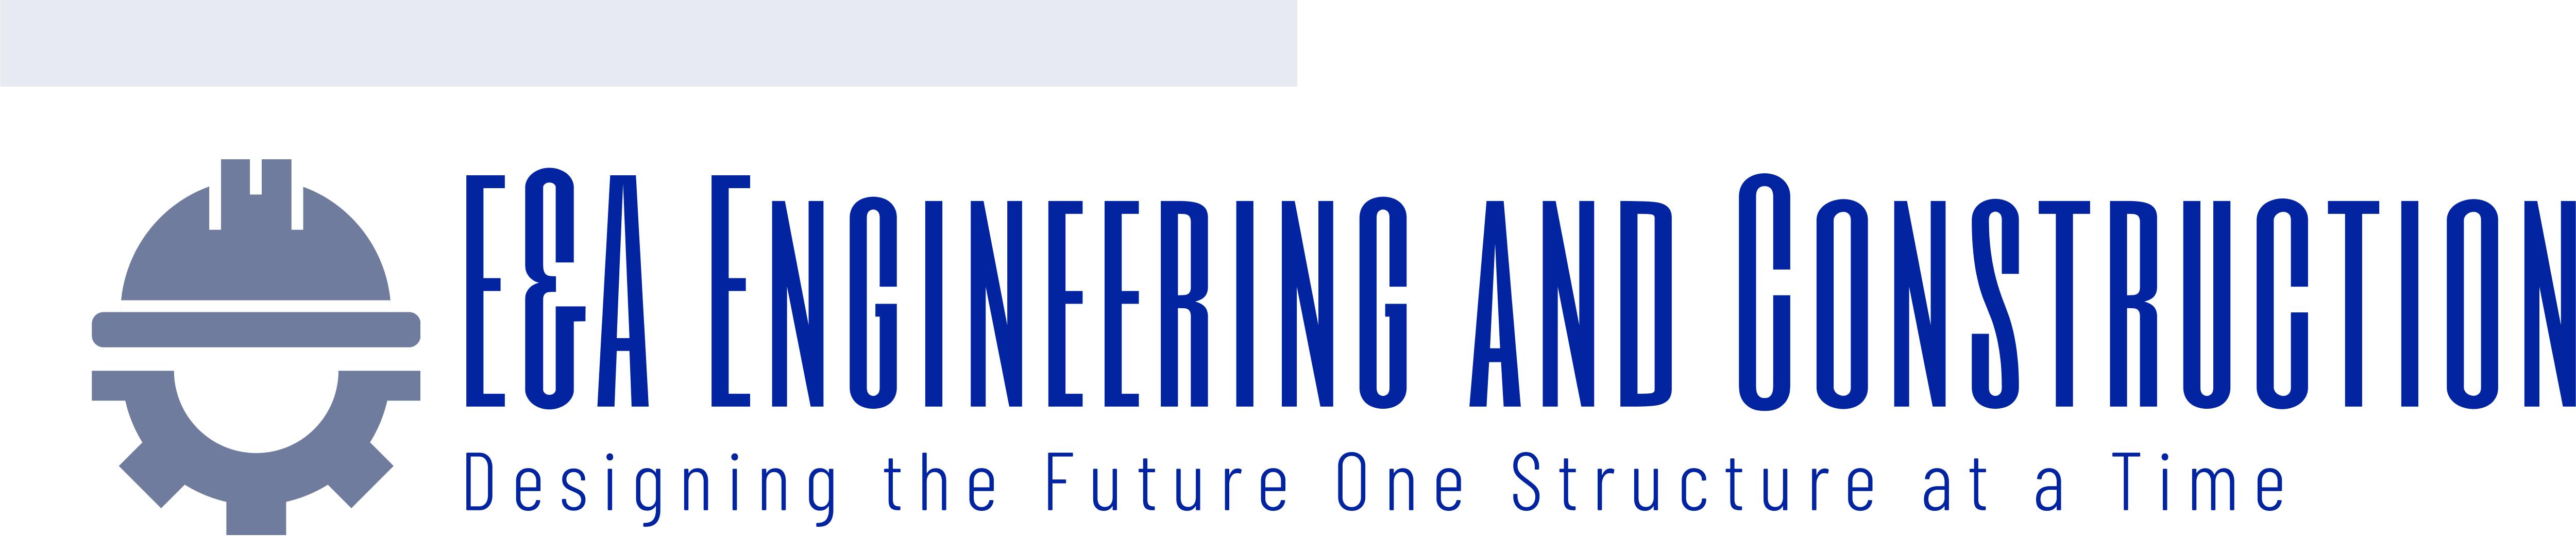 TEDxSanAantonio Fall 2019 THINKER Sponsor: E&A Engineering and Construction